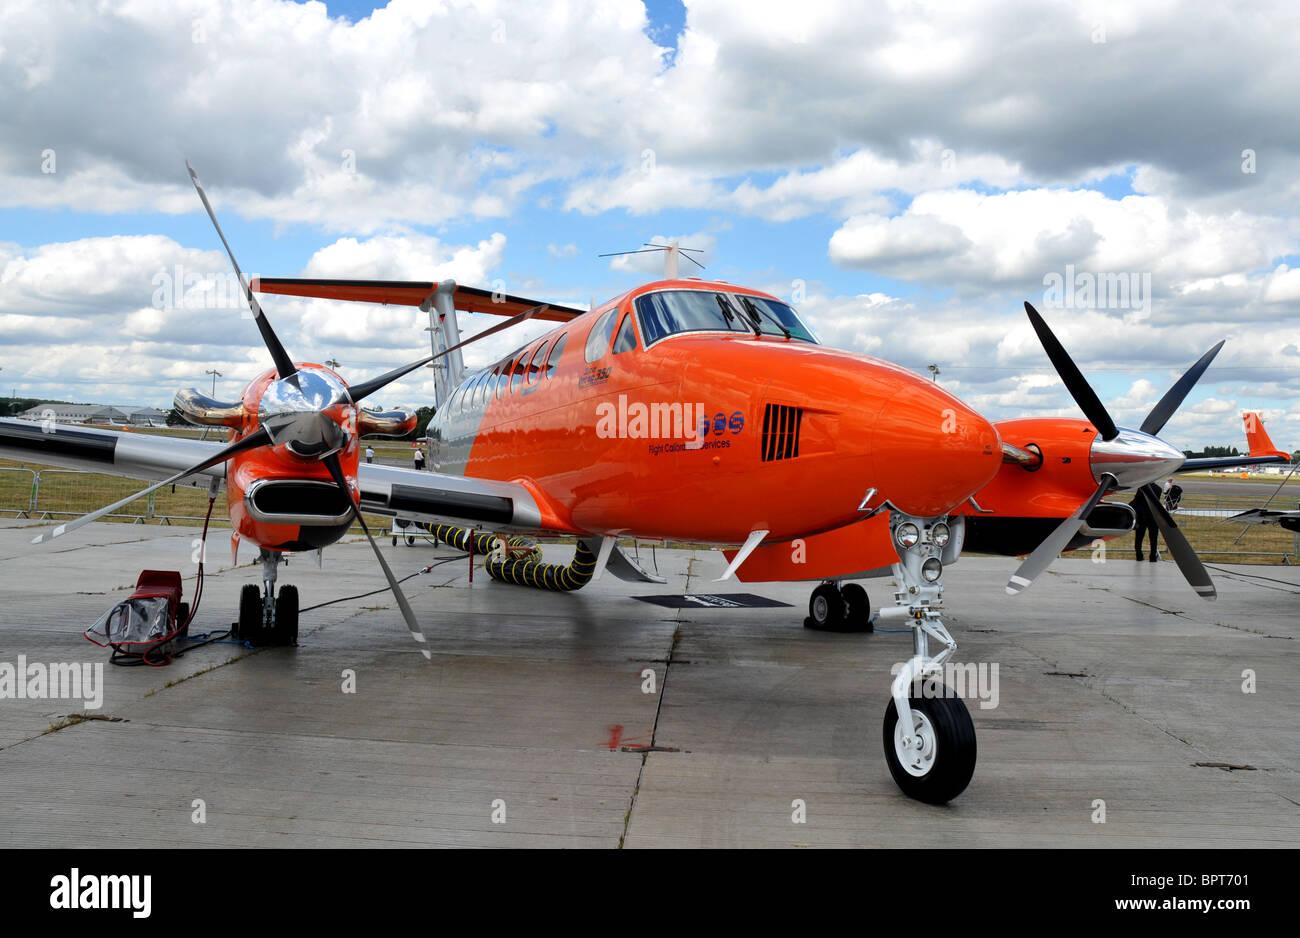 Beechcraft King Air, Super King Air 350 twin-turboprop aircraft - Stock Image